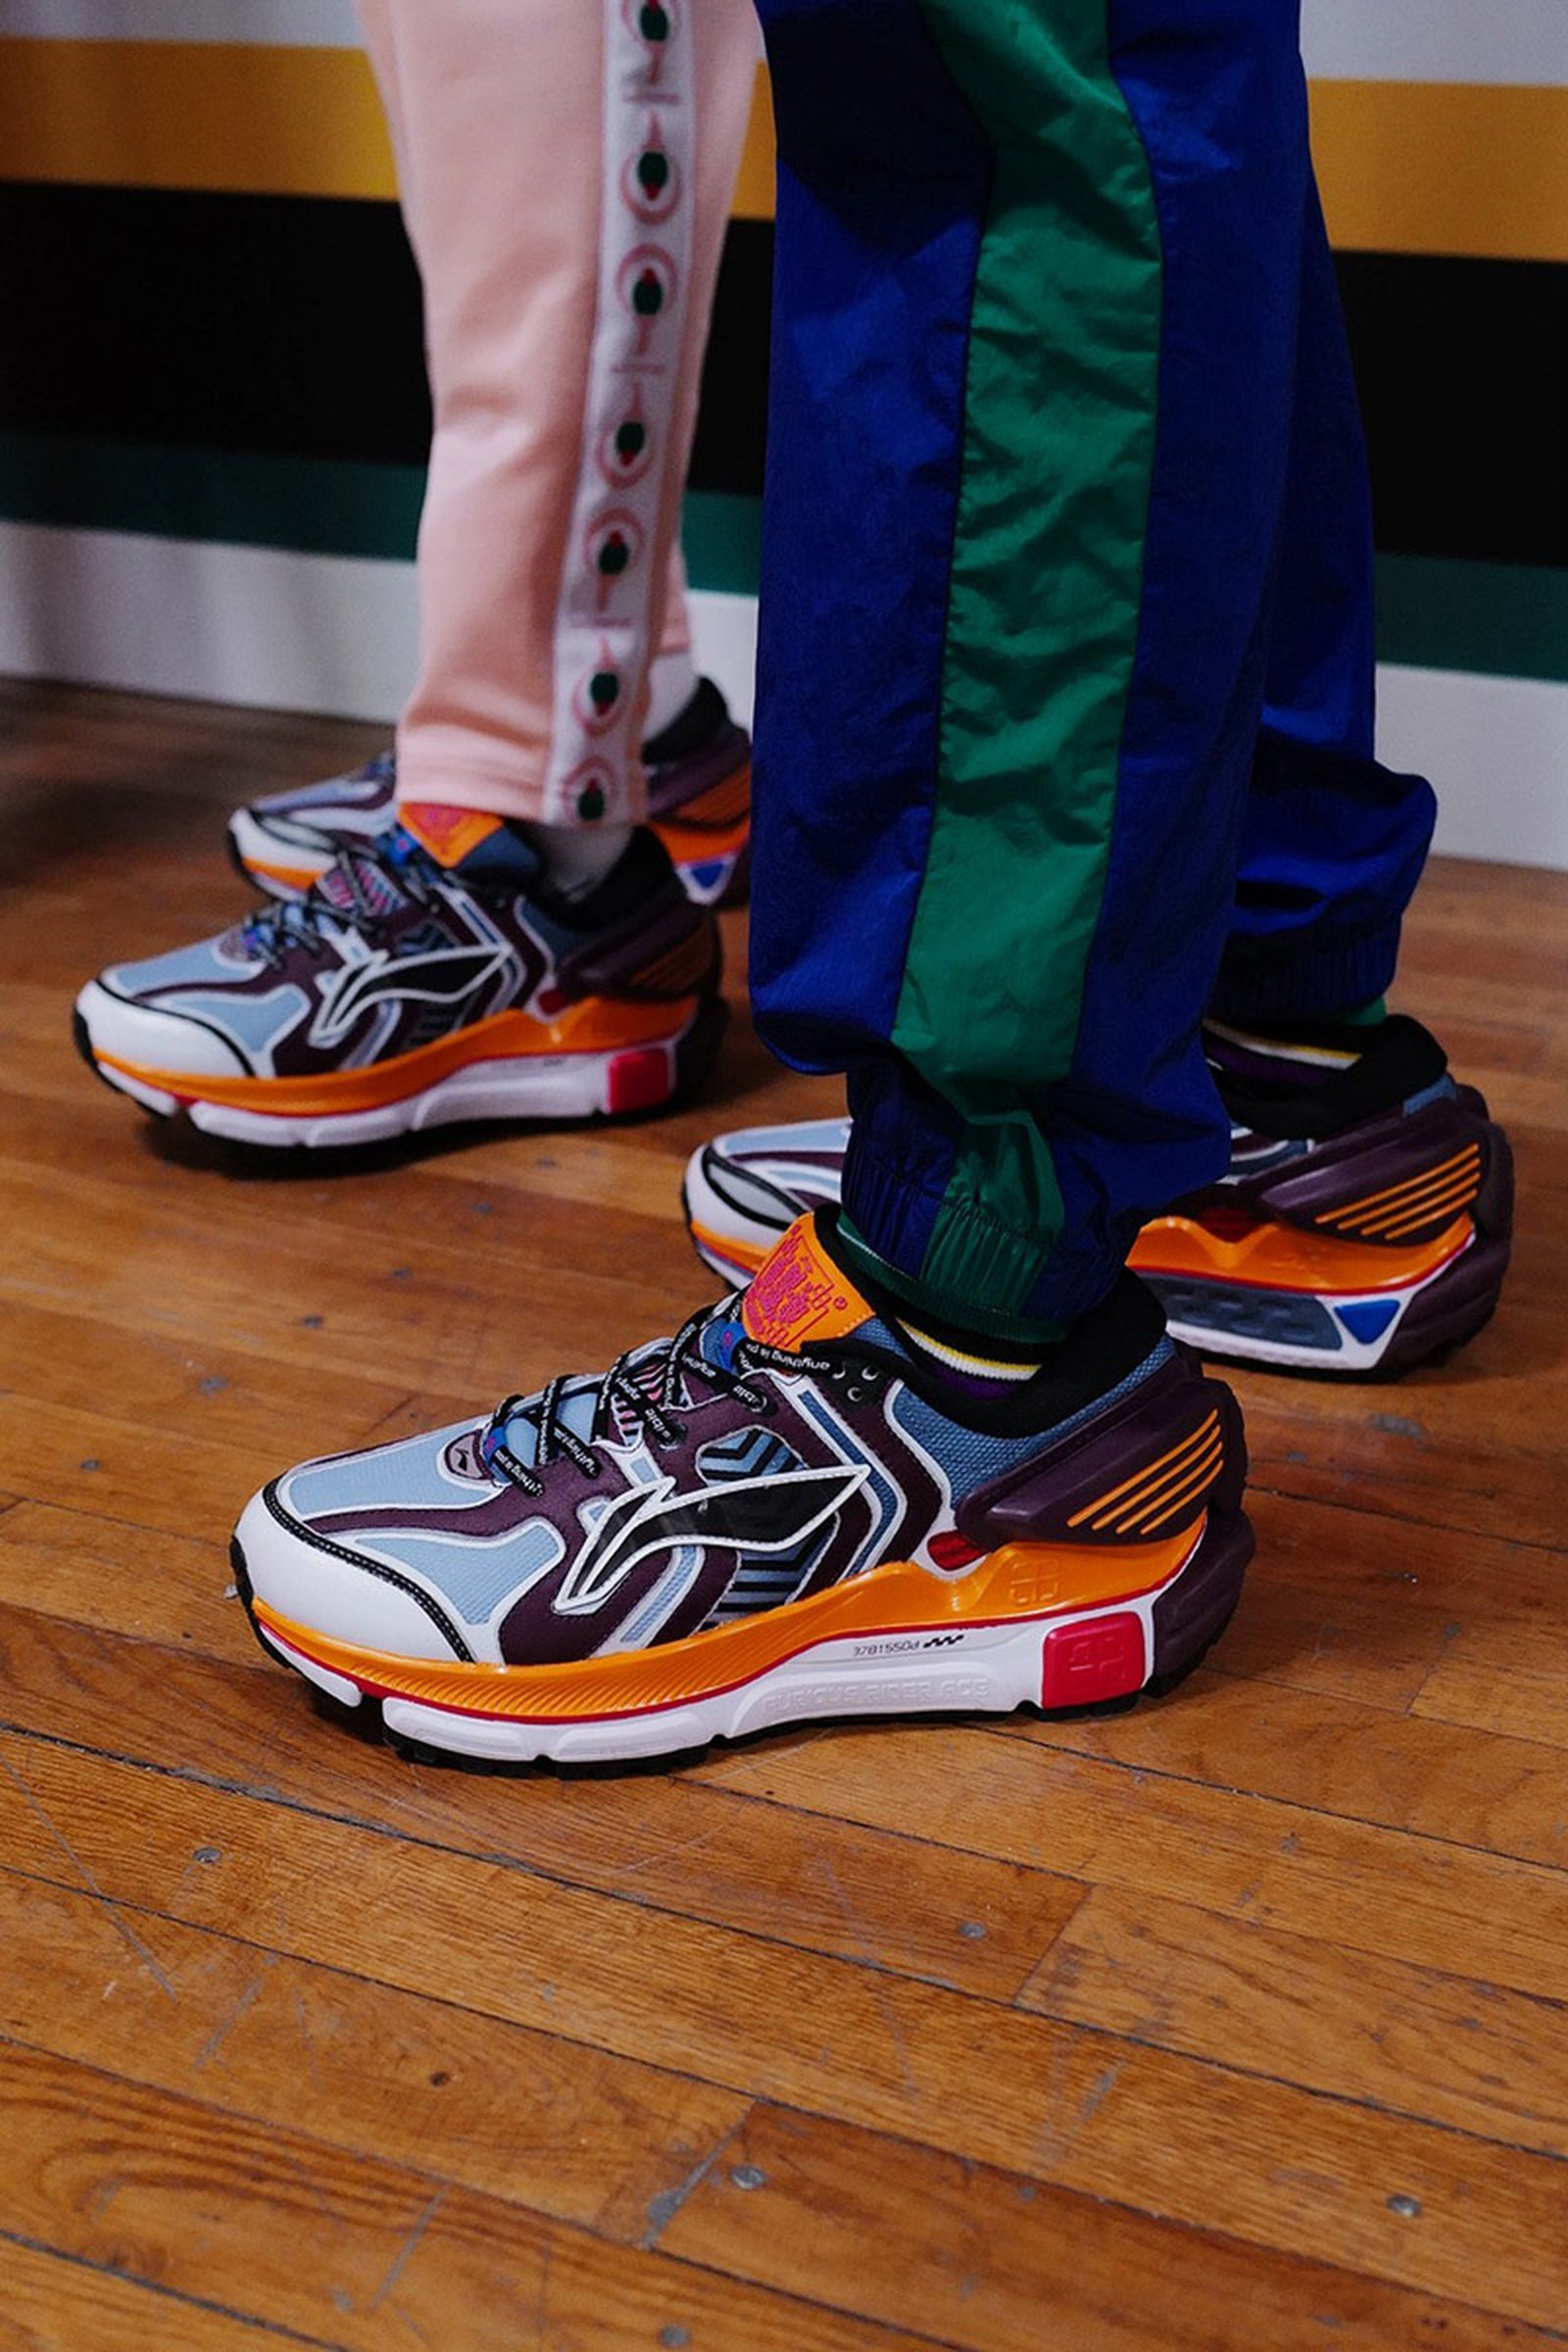 li ning ss20 sneakers IMG 1689 Louis Vuitton Nike OAMC